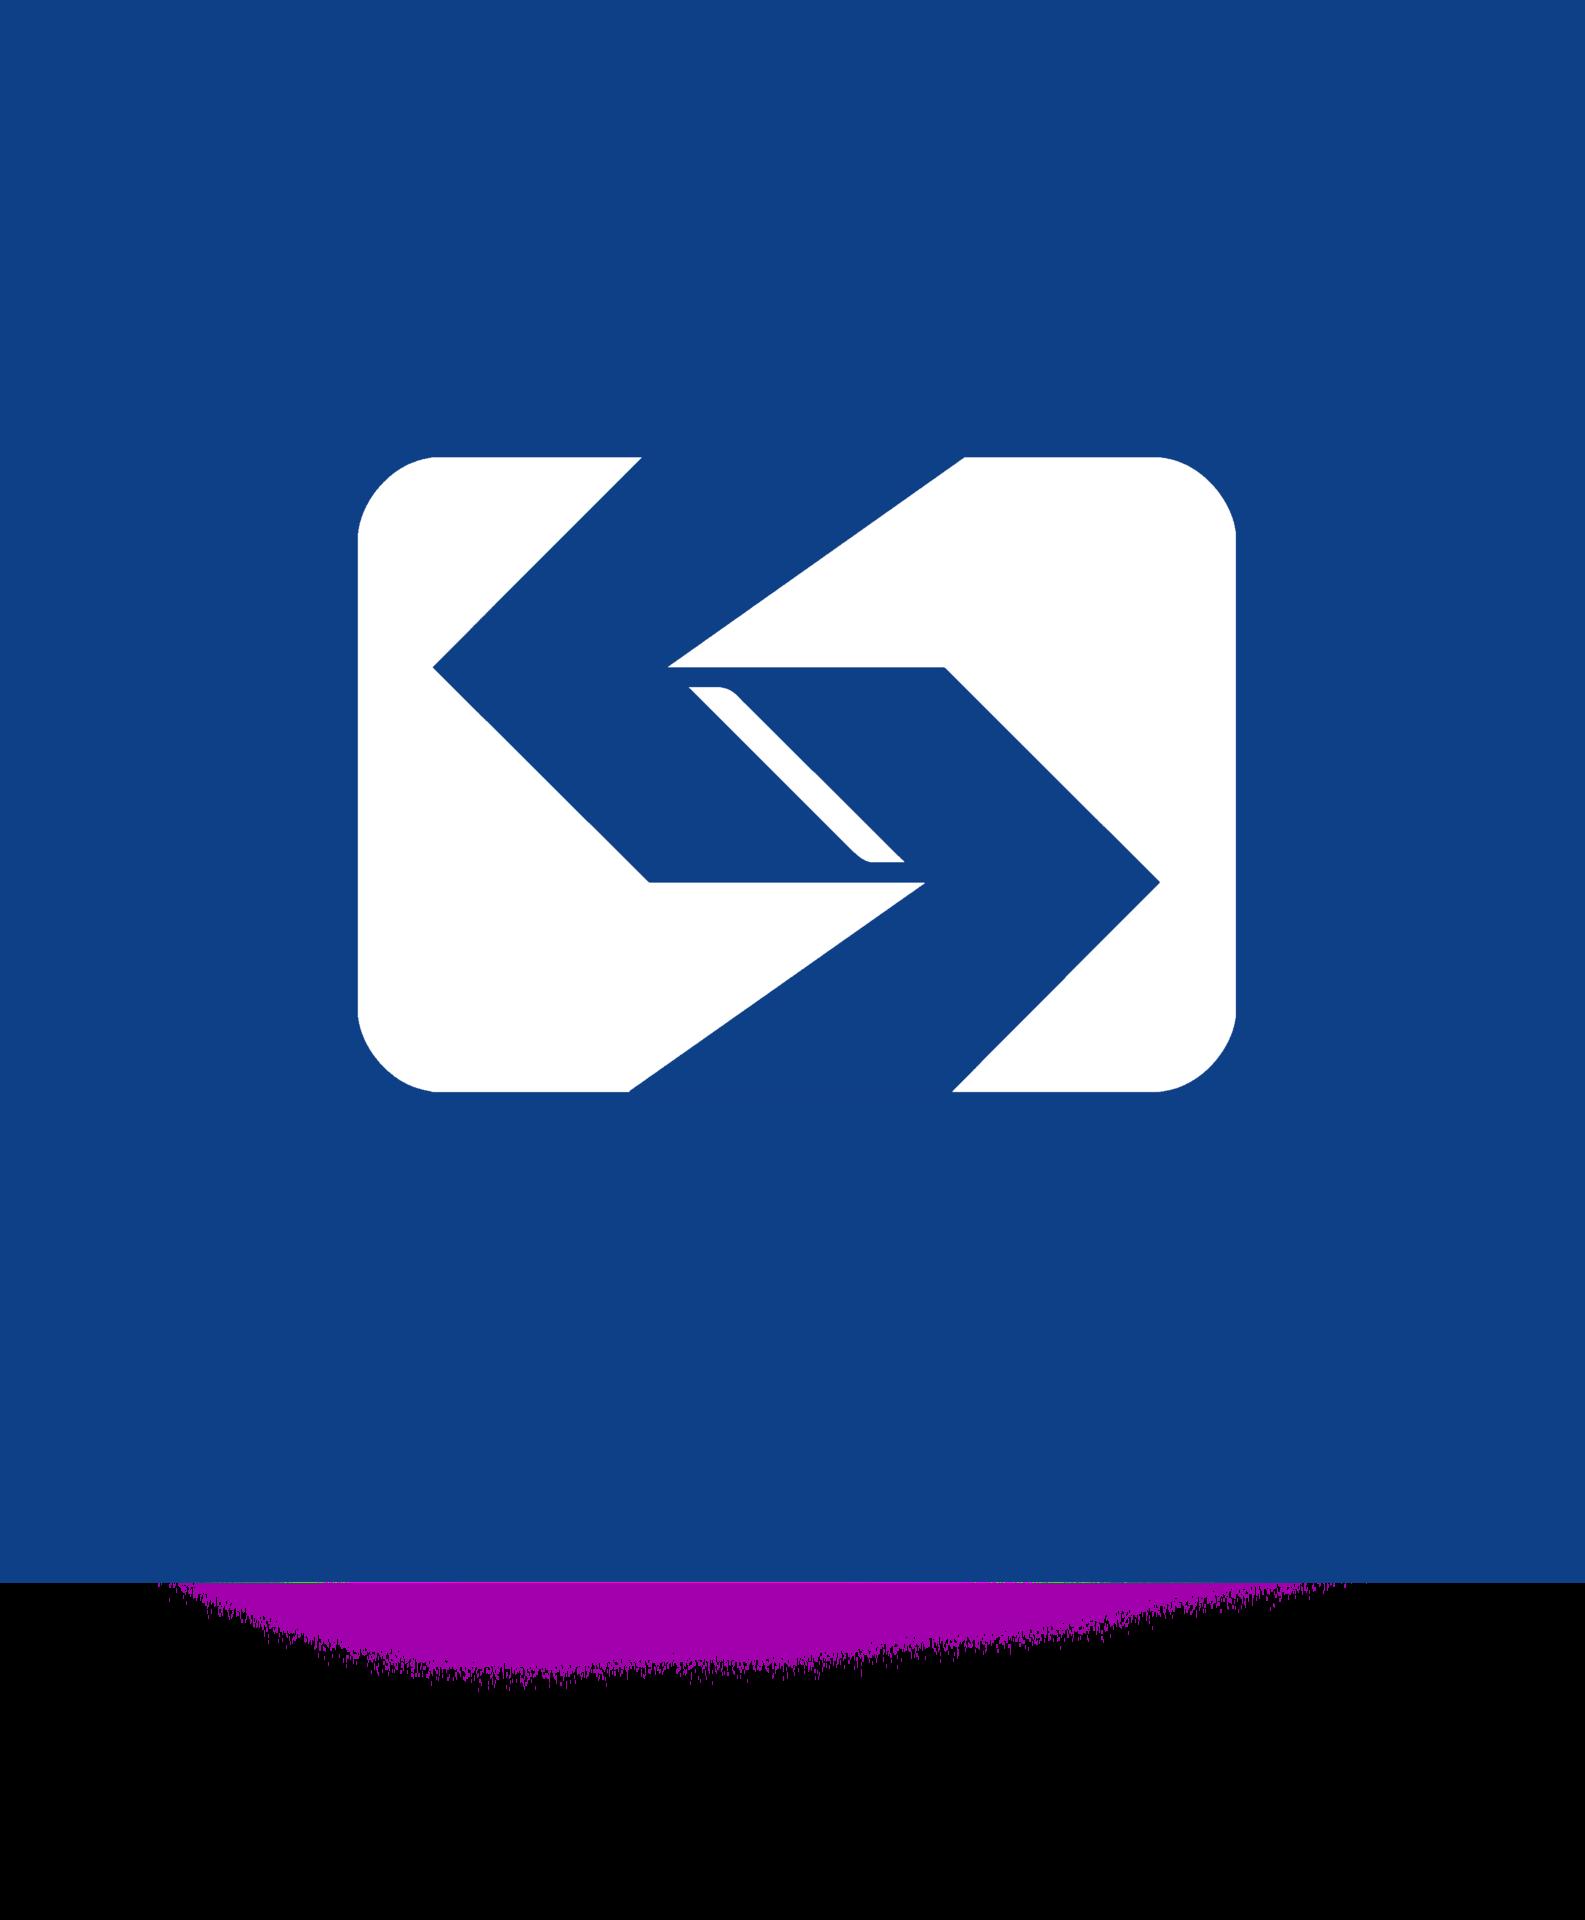 Transpasses